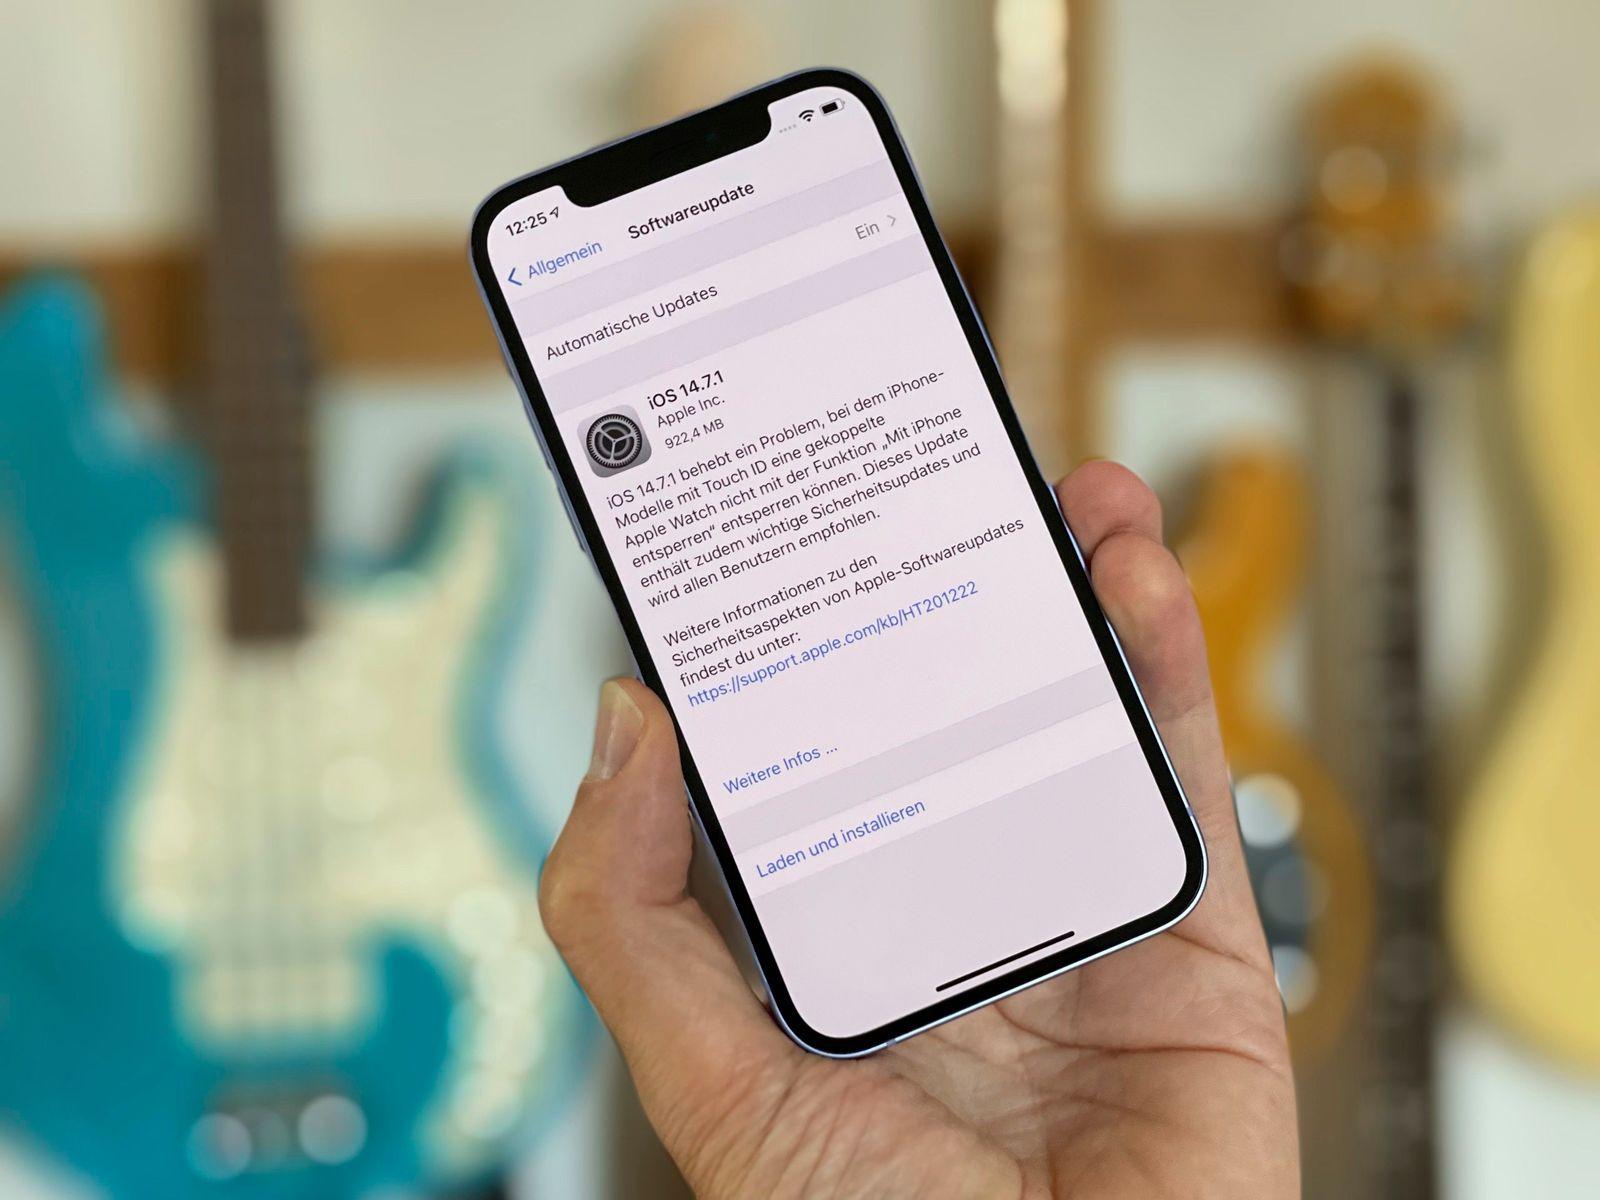 Apple iPhone iOS 14.7.1